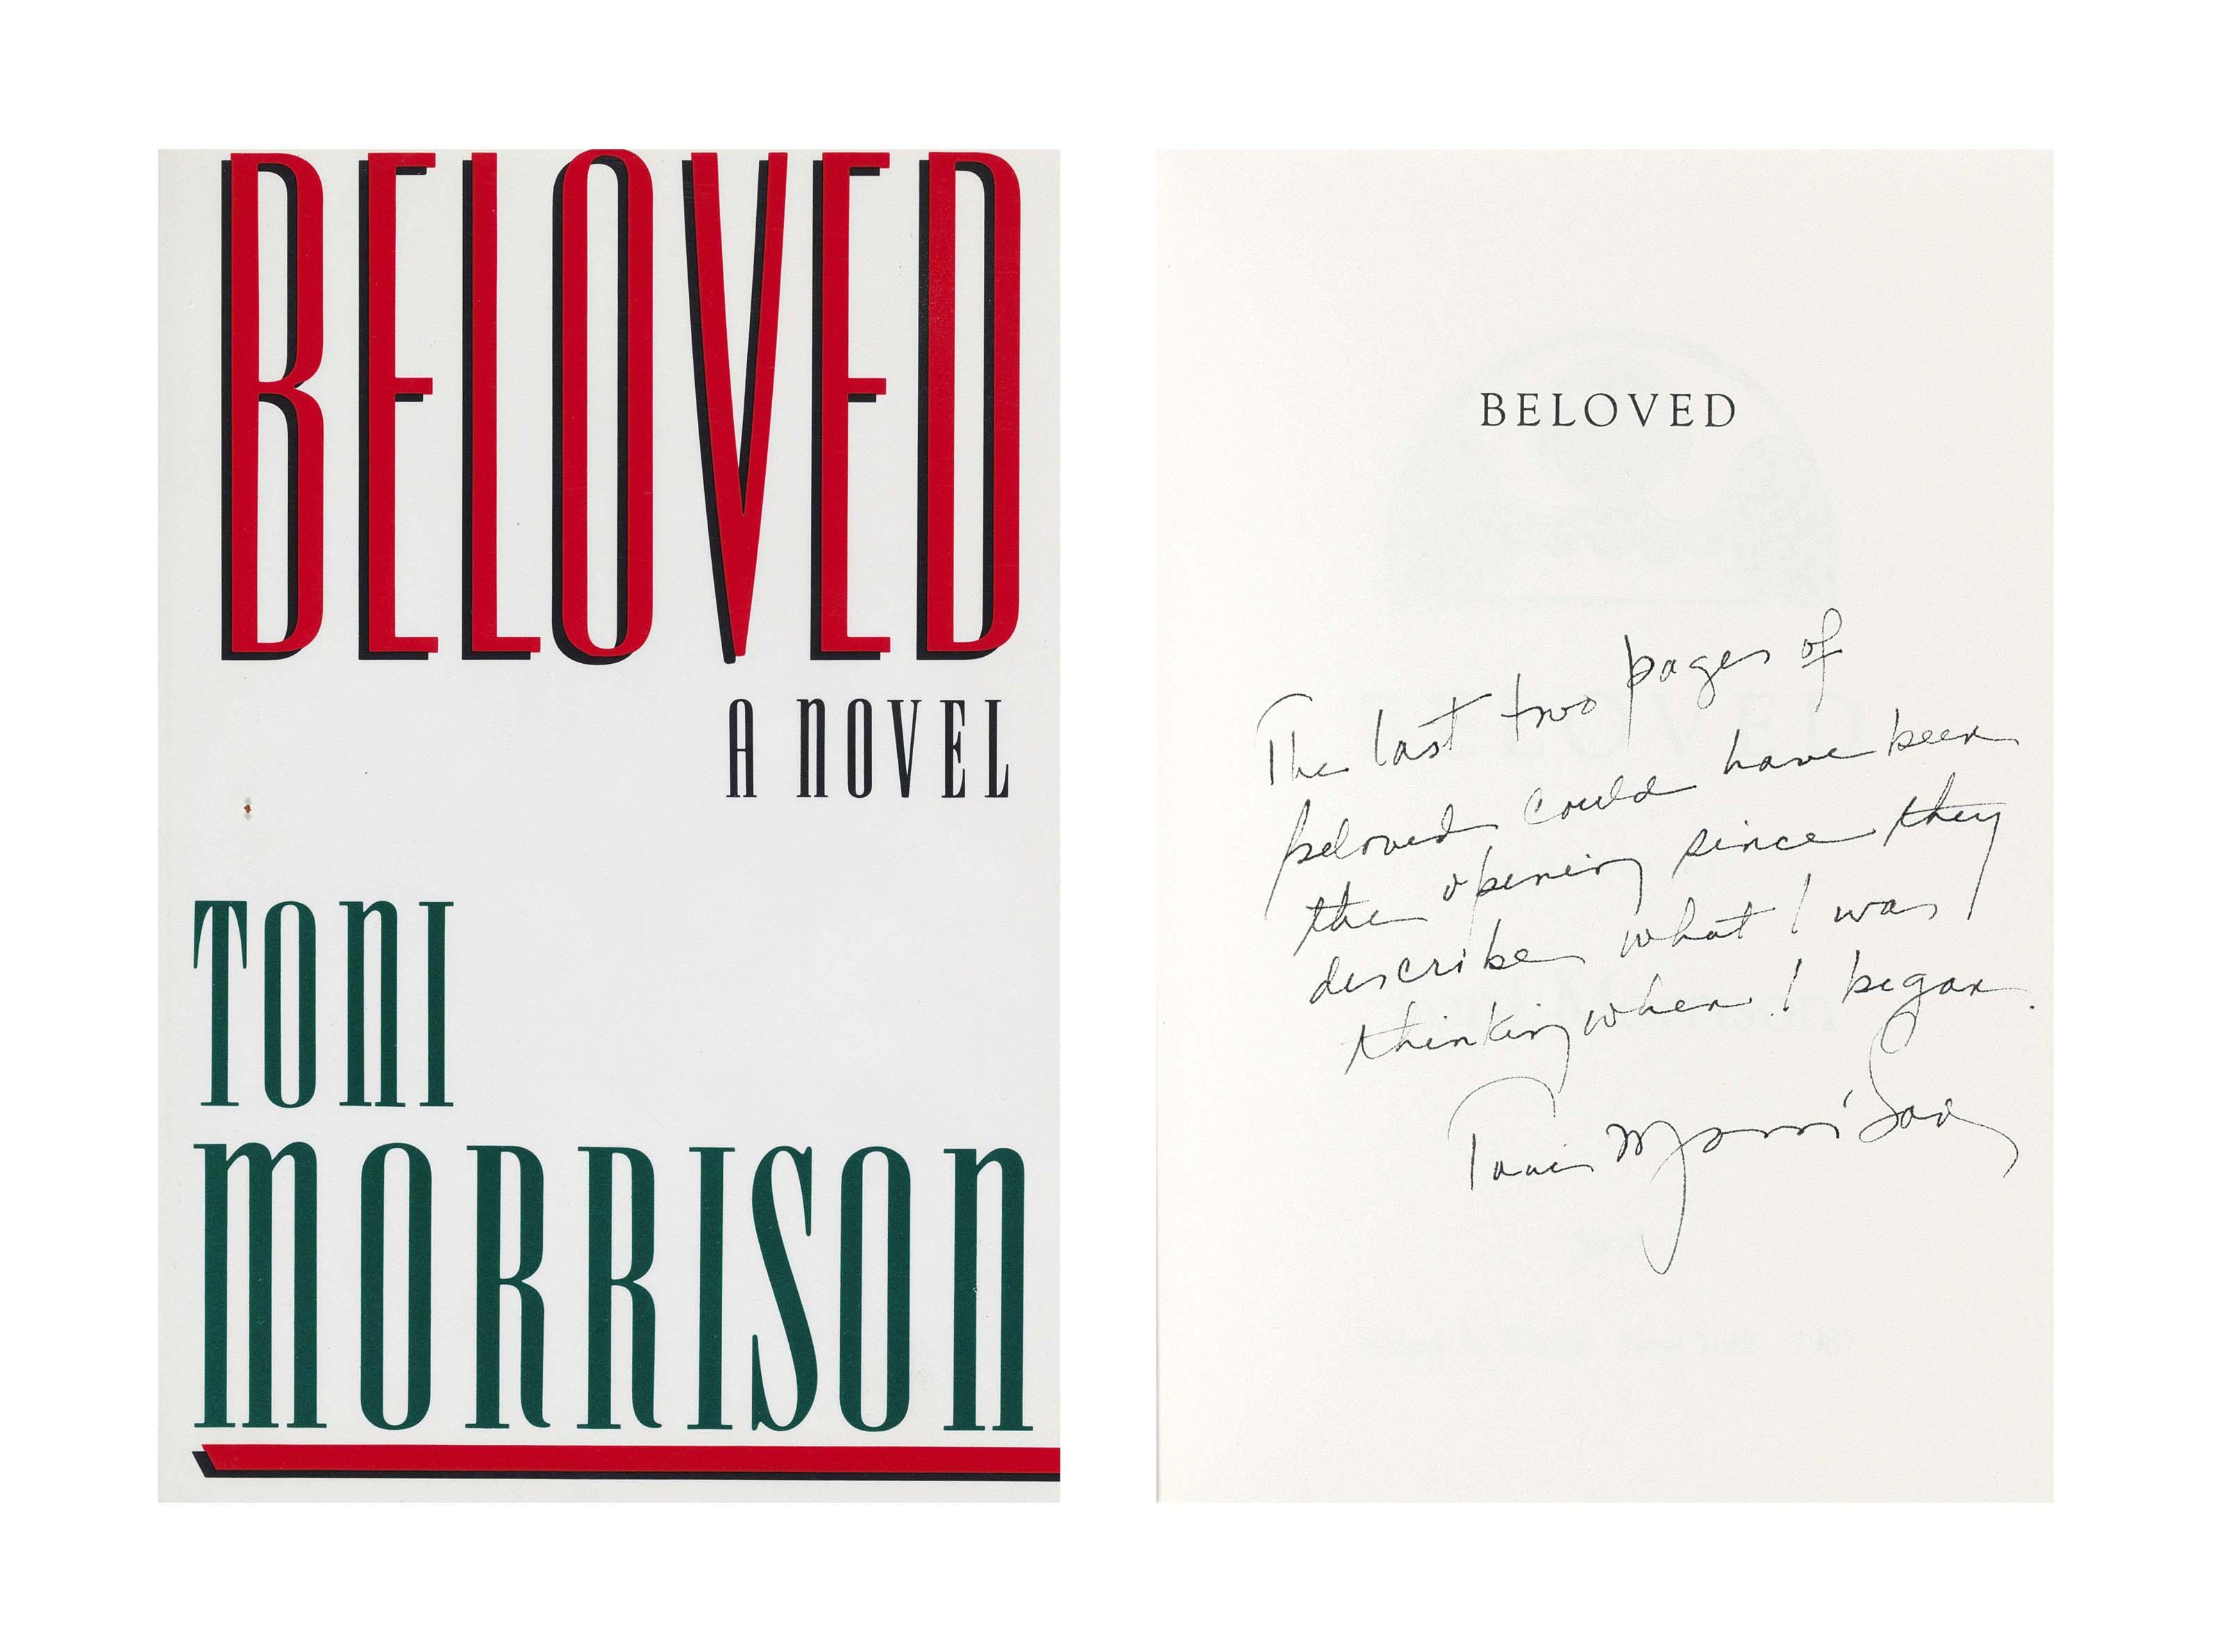 MORRISON, Toni (b. 1931). Beloved. New York: Alfred A. Knopf, 1987. 8°. Original cloth; dust jacket.